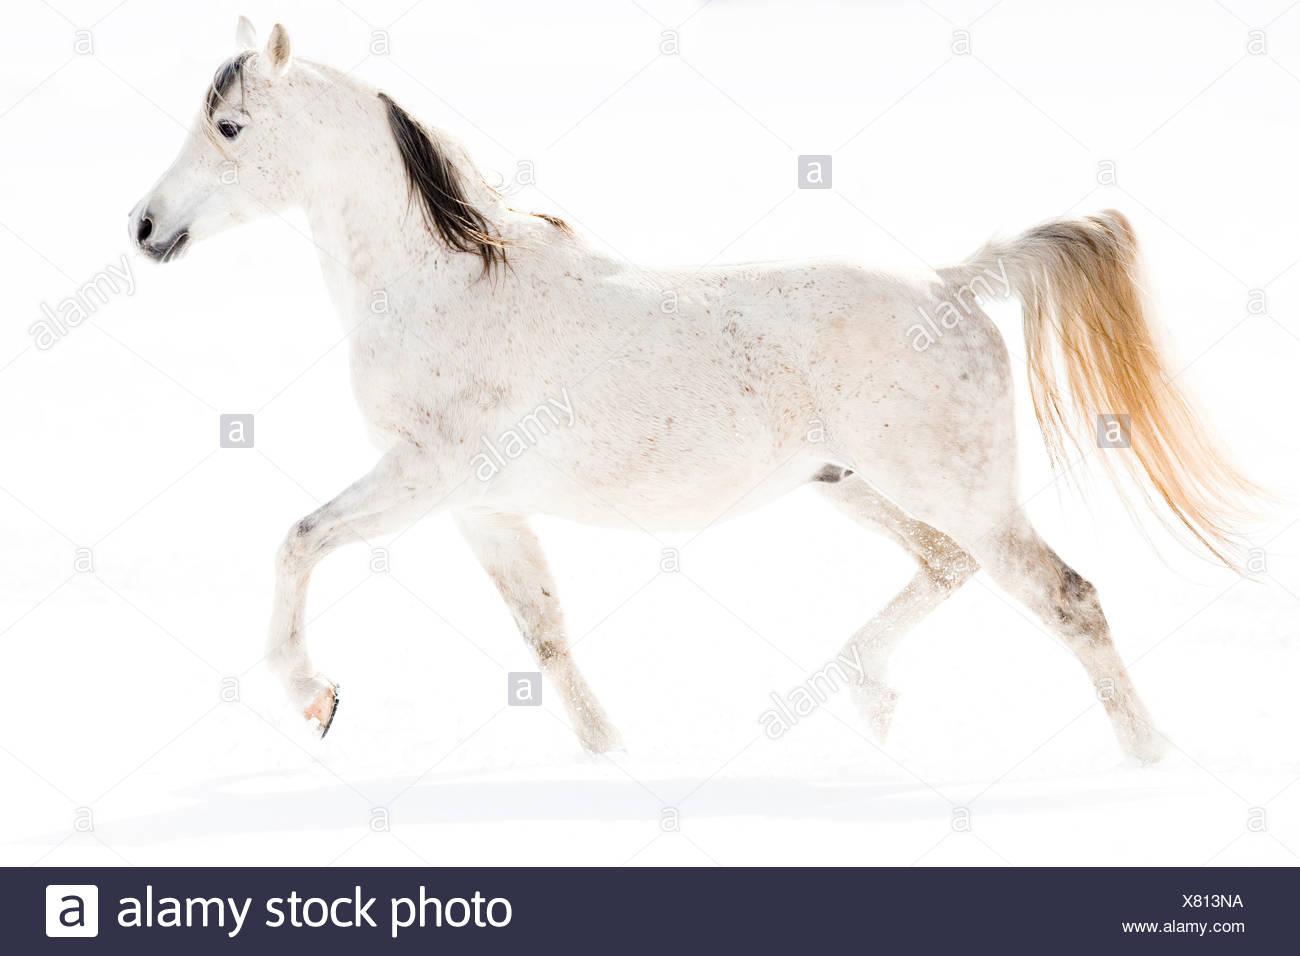 Arab Horse Arabian Horse Grey Stallion Trotting In Snow Stock Photo Alamy